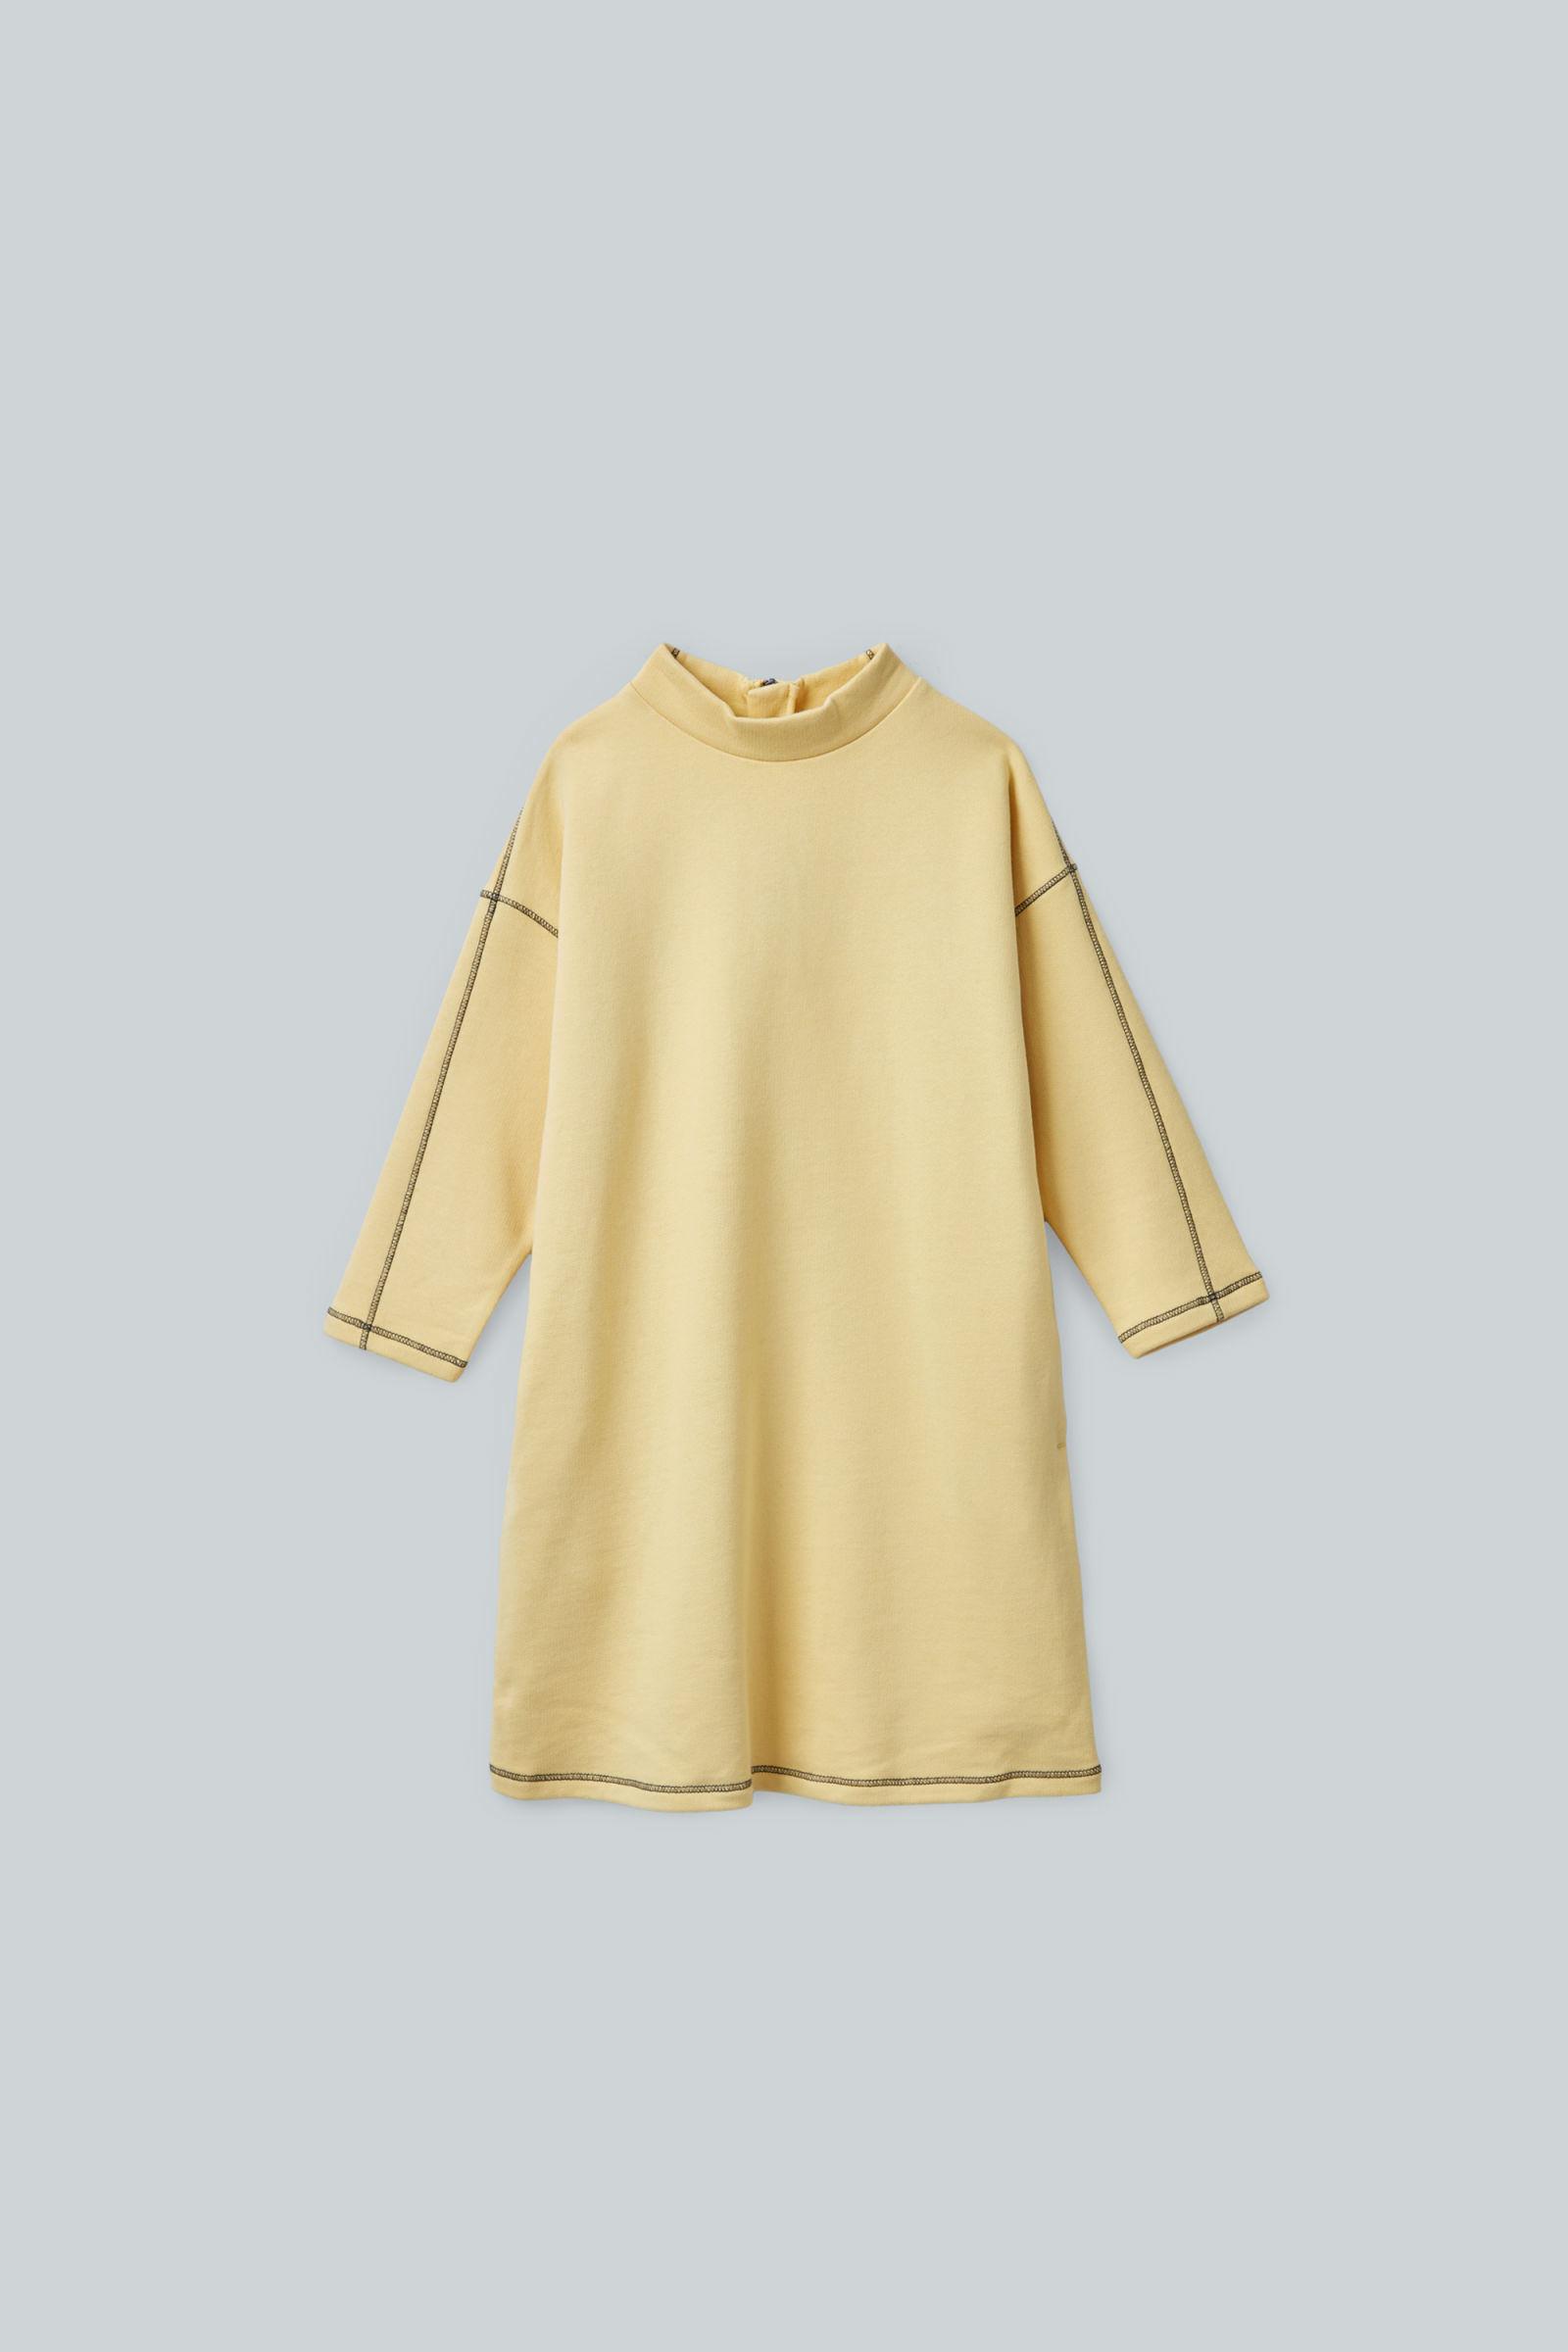 COS 집업 코튼 드레스의 옐로우컬러 상품컷입니다.